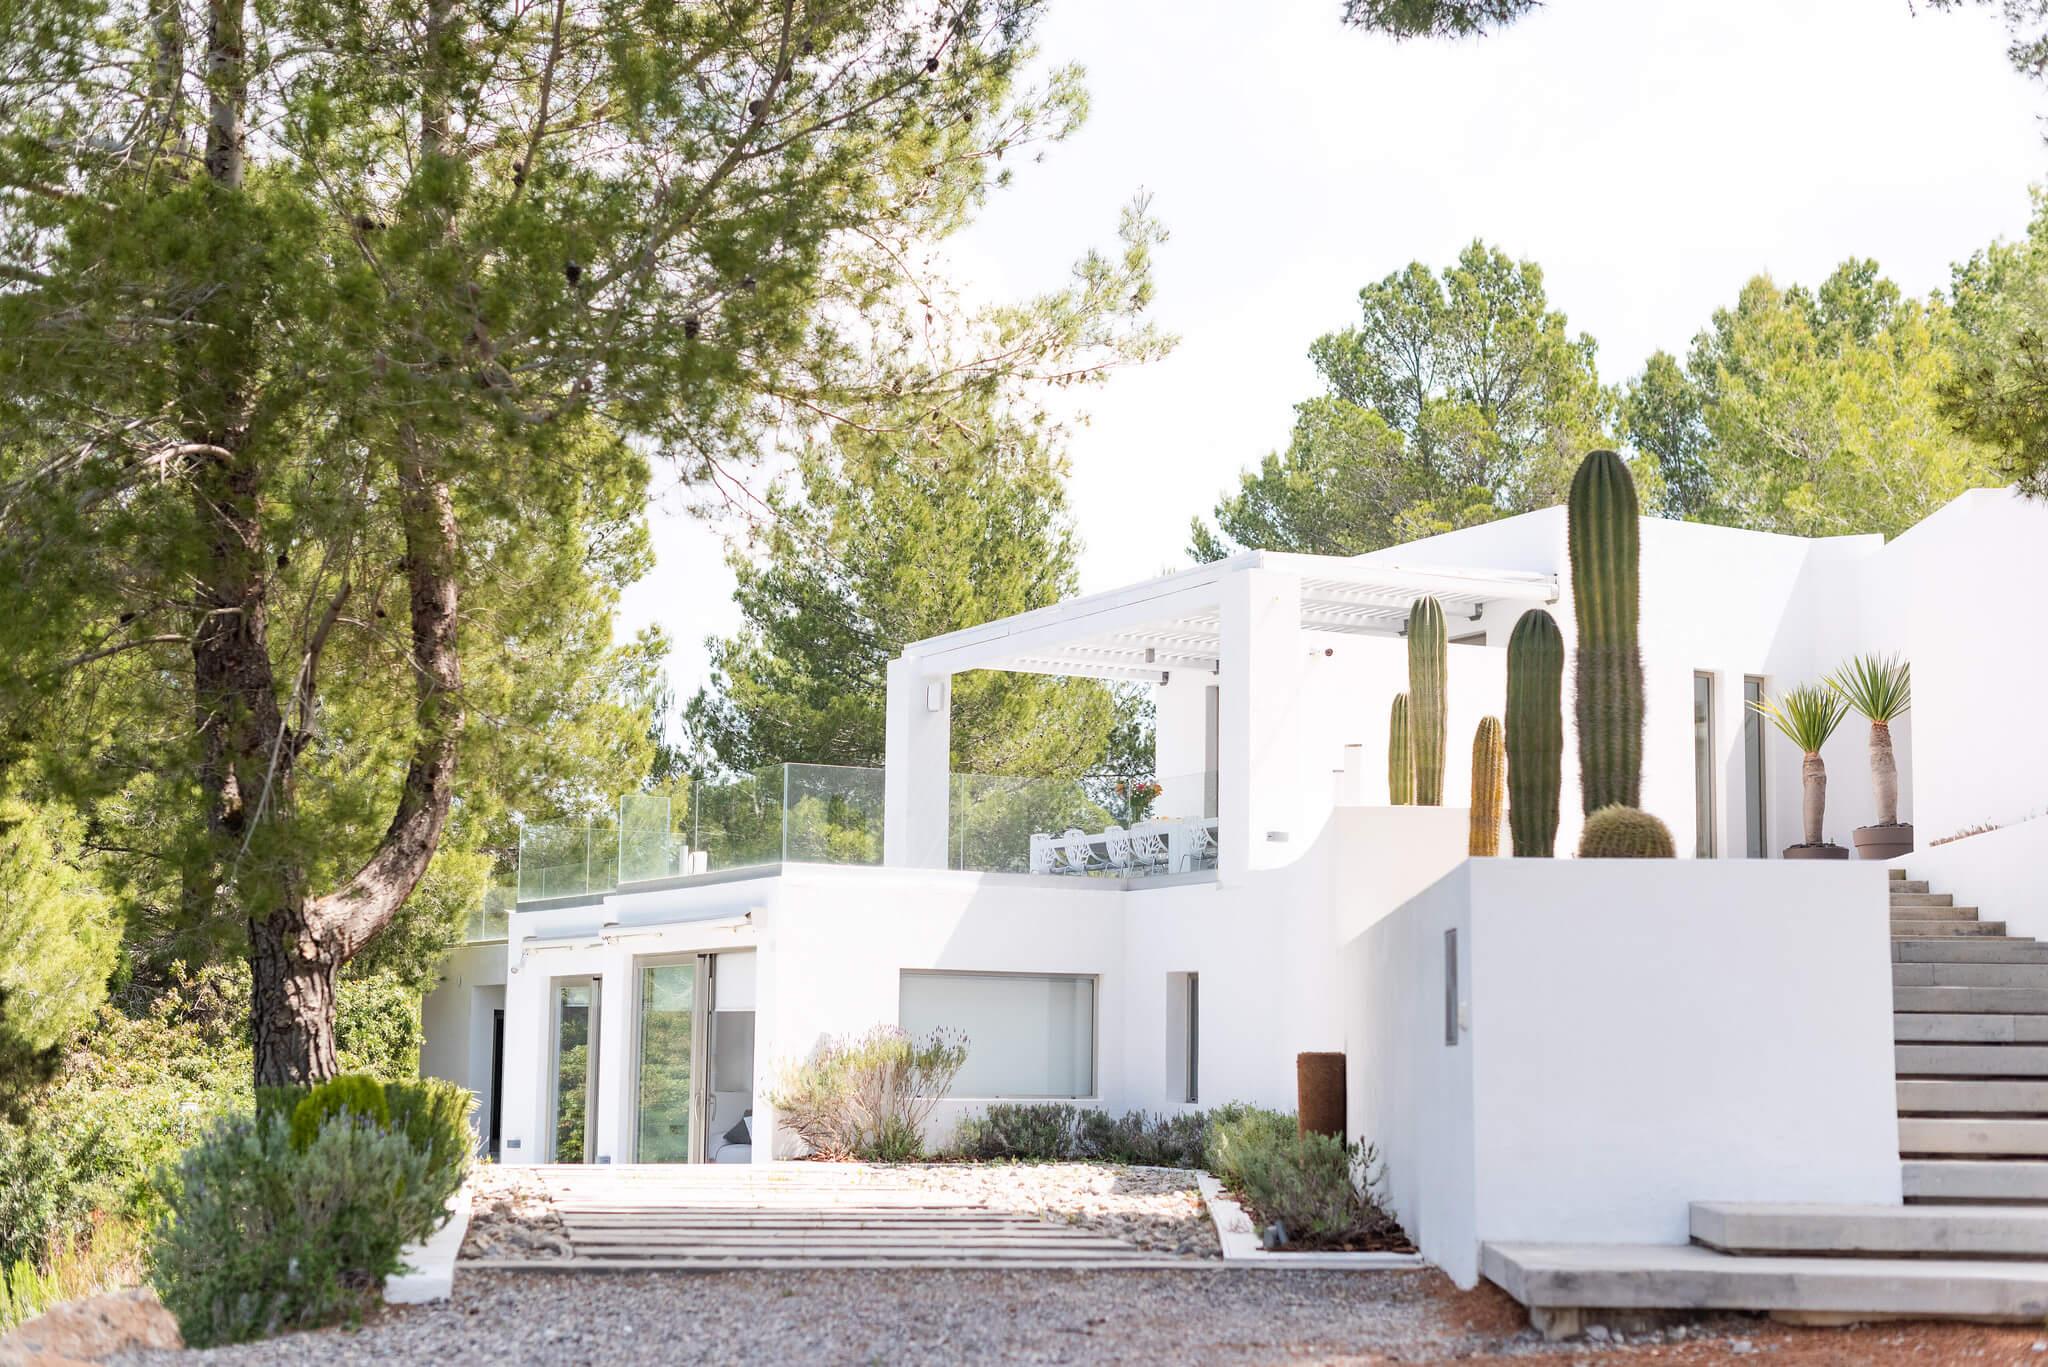 https://www.white-ibiza.com/wp-content/uploads/2020/05/white-ibiza-villas-can-dela.jpg